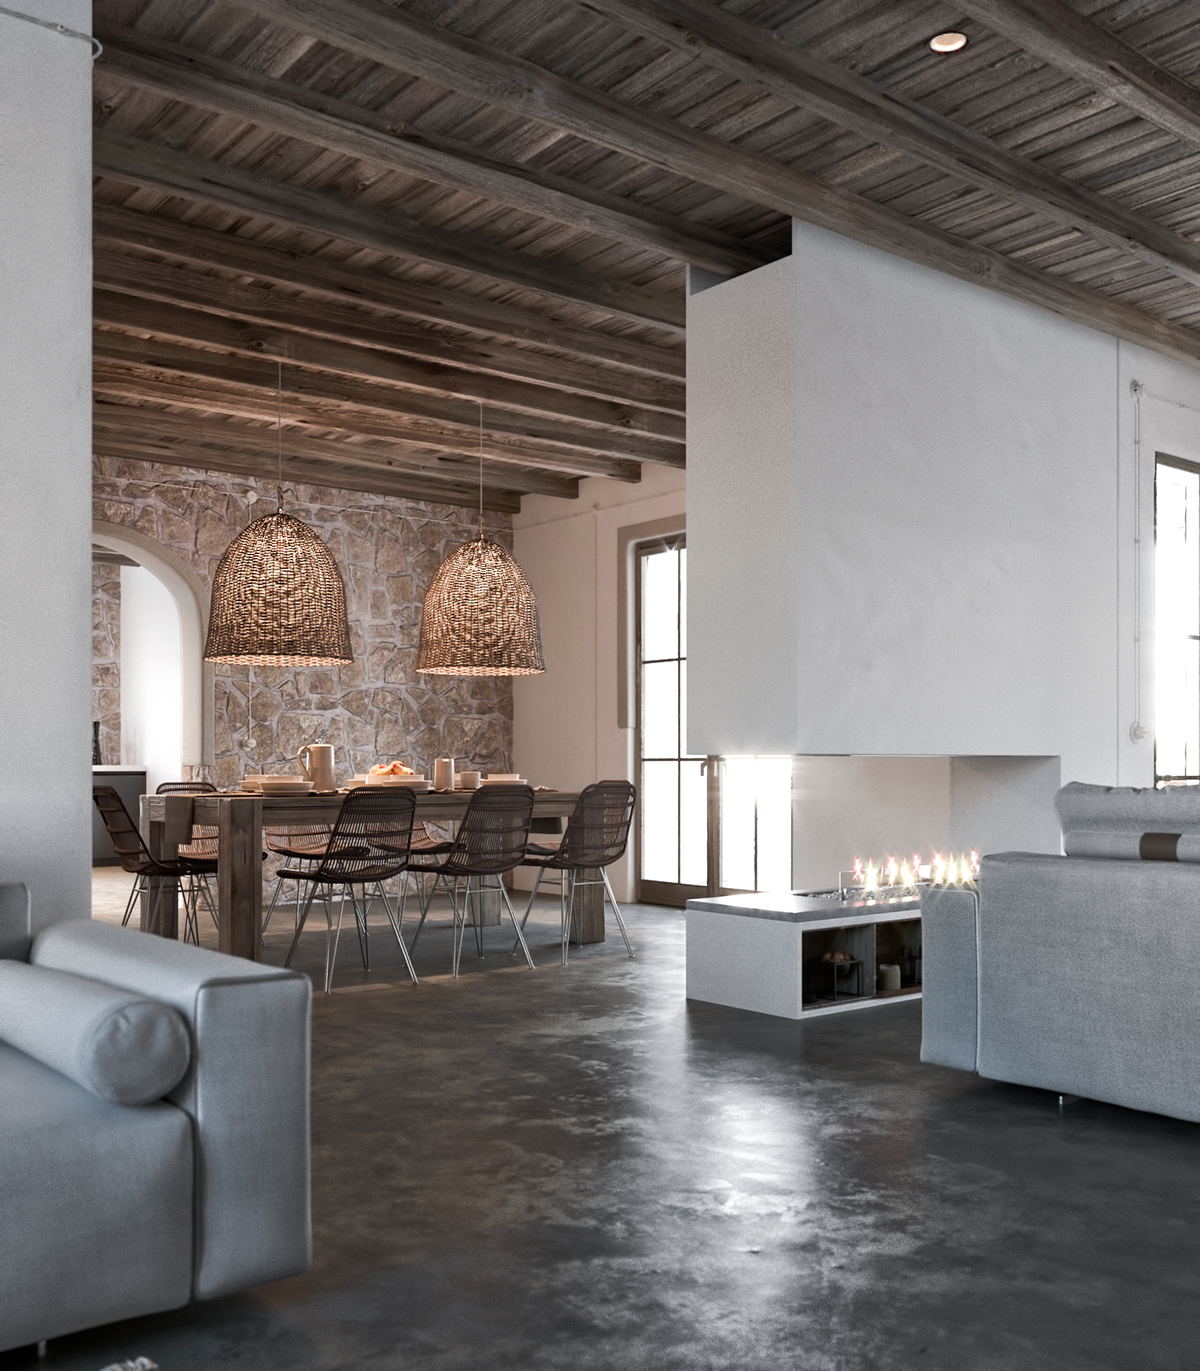 3D visualisation Interior design CG architecturevisualisation 3dsmax